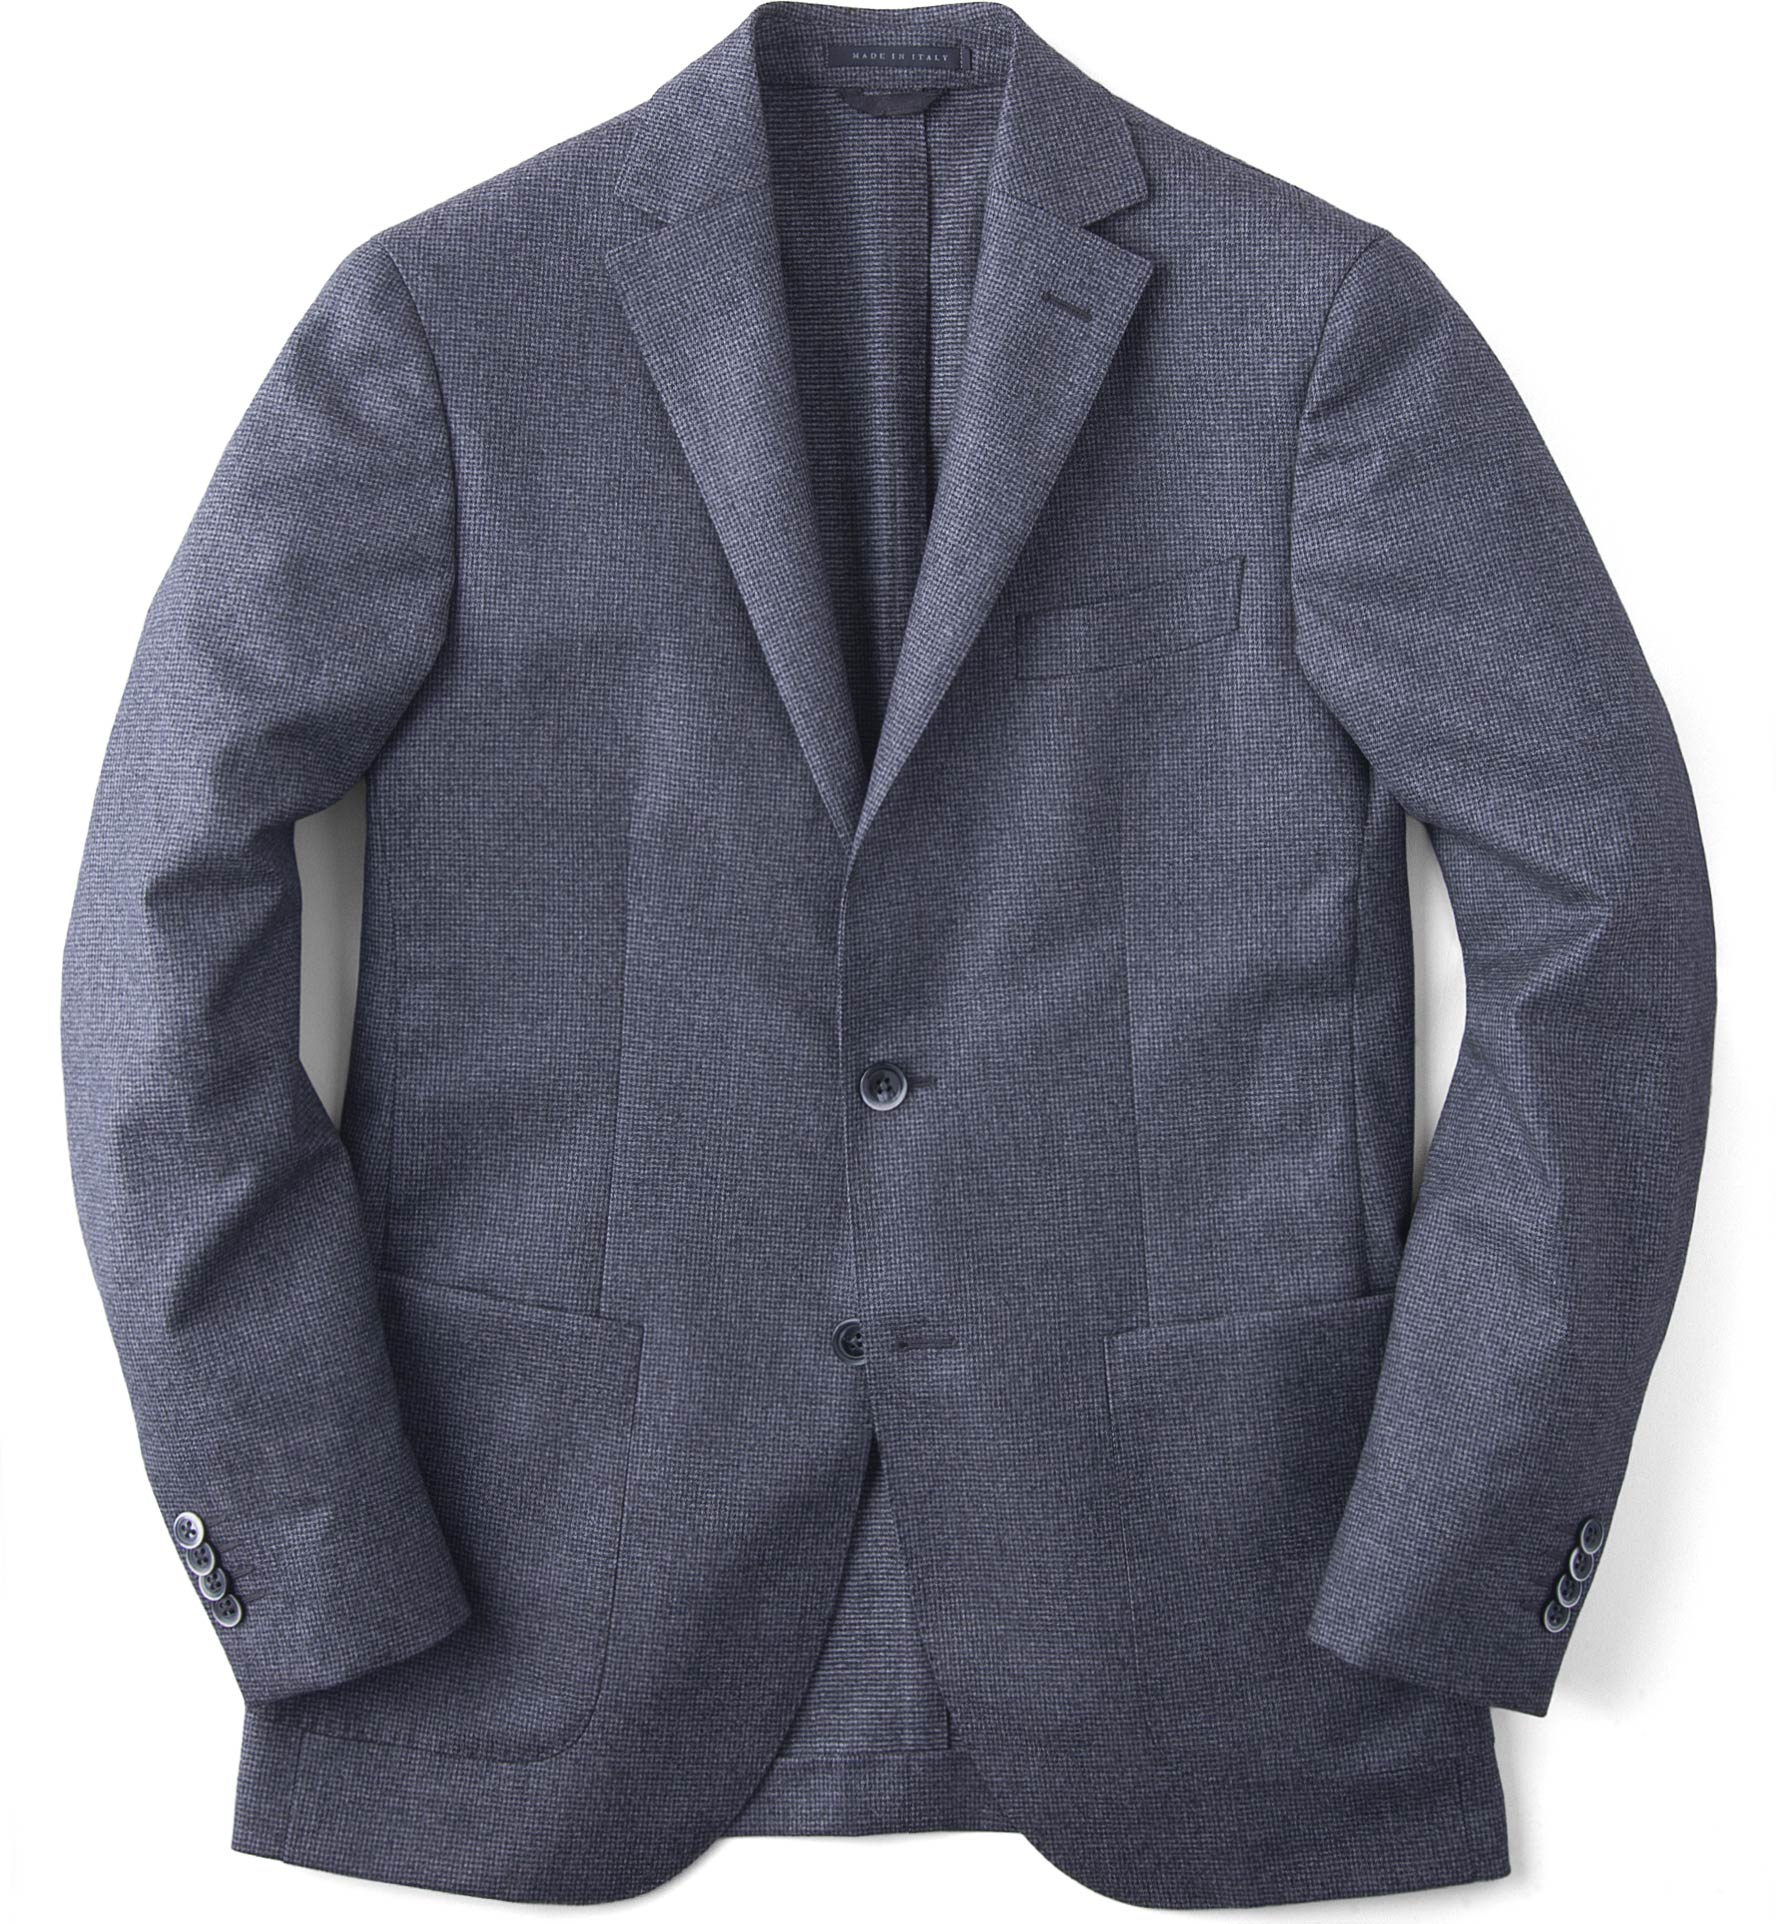 Zoom Image of Grey Houndstooth Genova Jacket